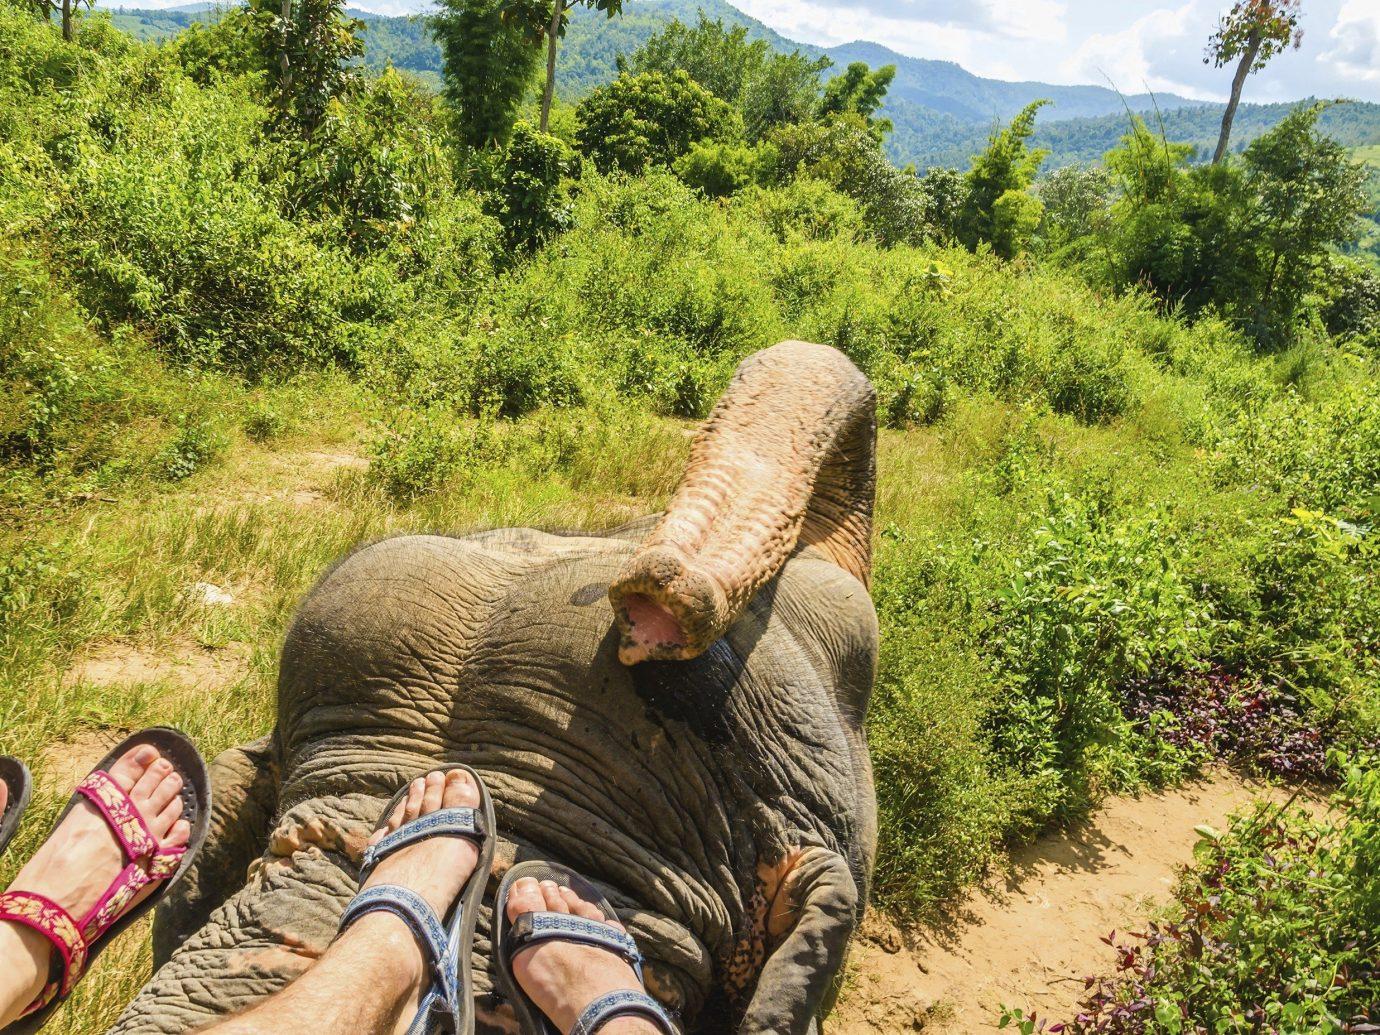 Trip Ideas tree outdoor habitat man elephant wilderness natural environment Wildlife Jungle Forest Adventure rainforest Safari